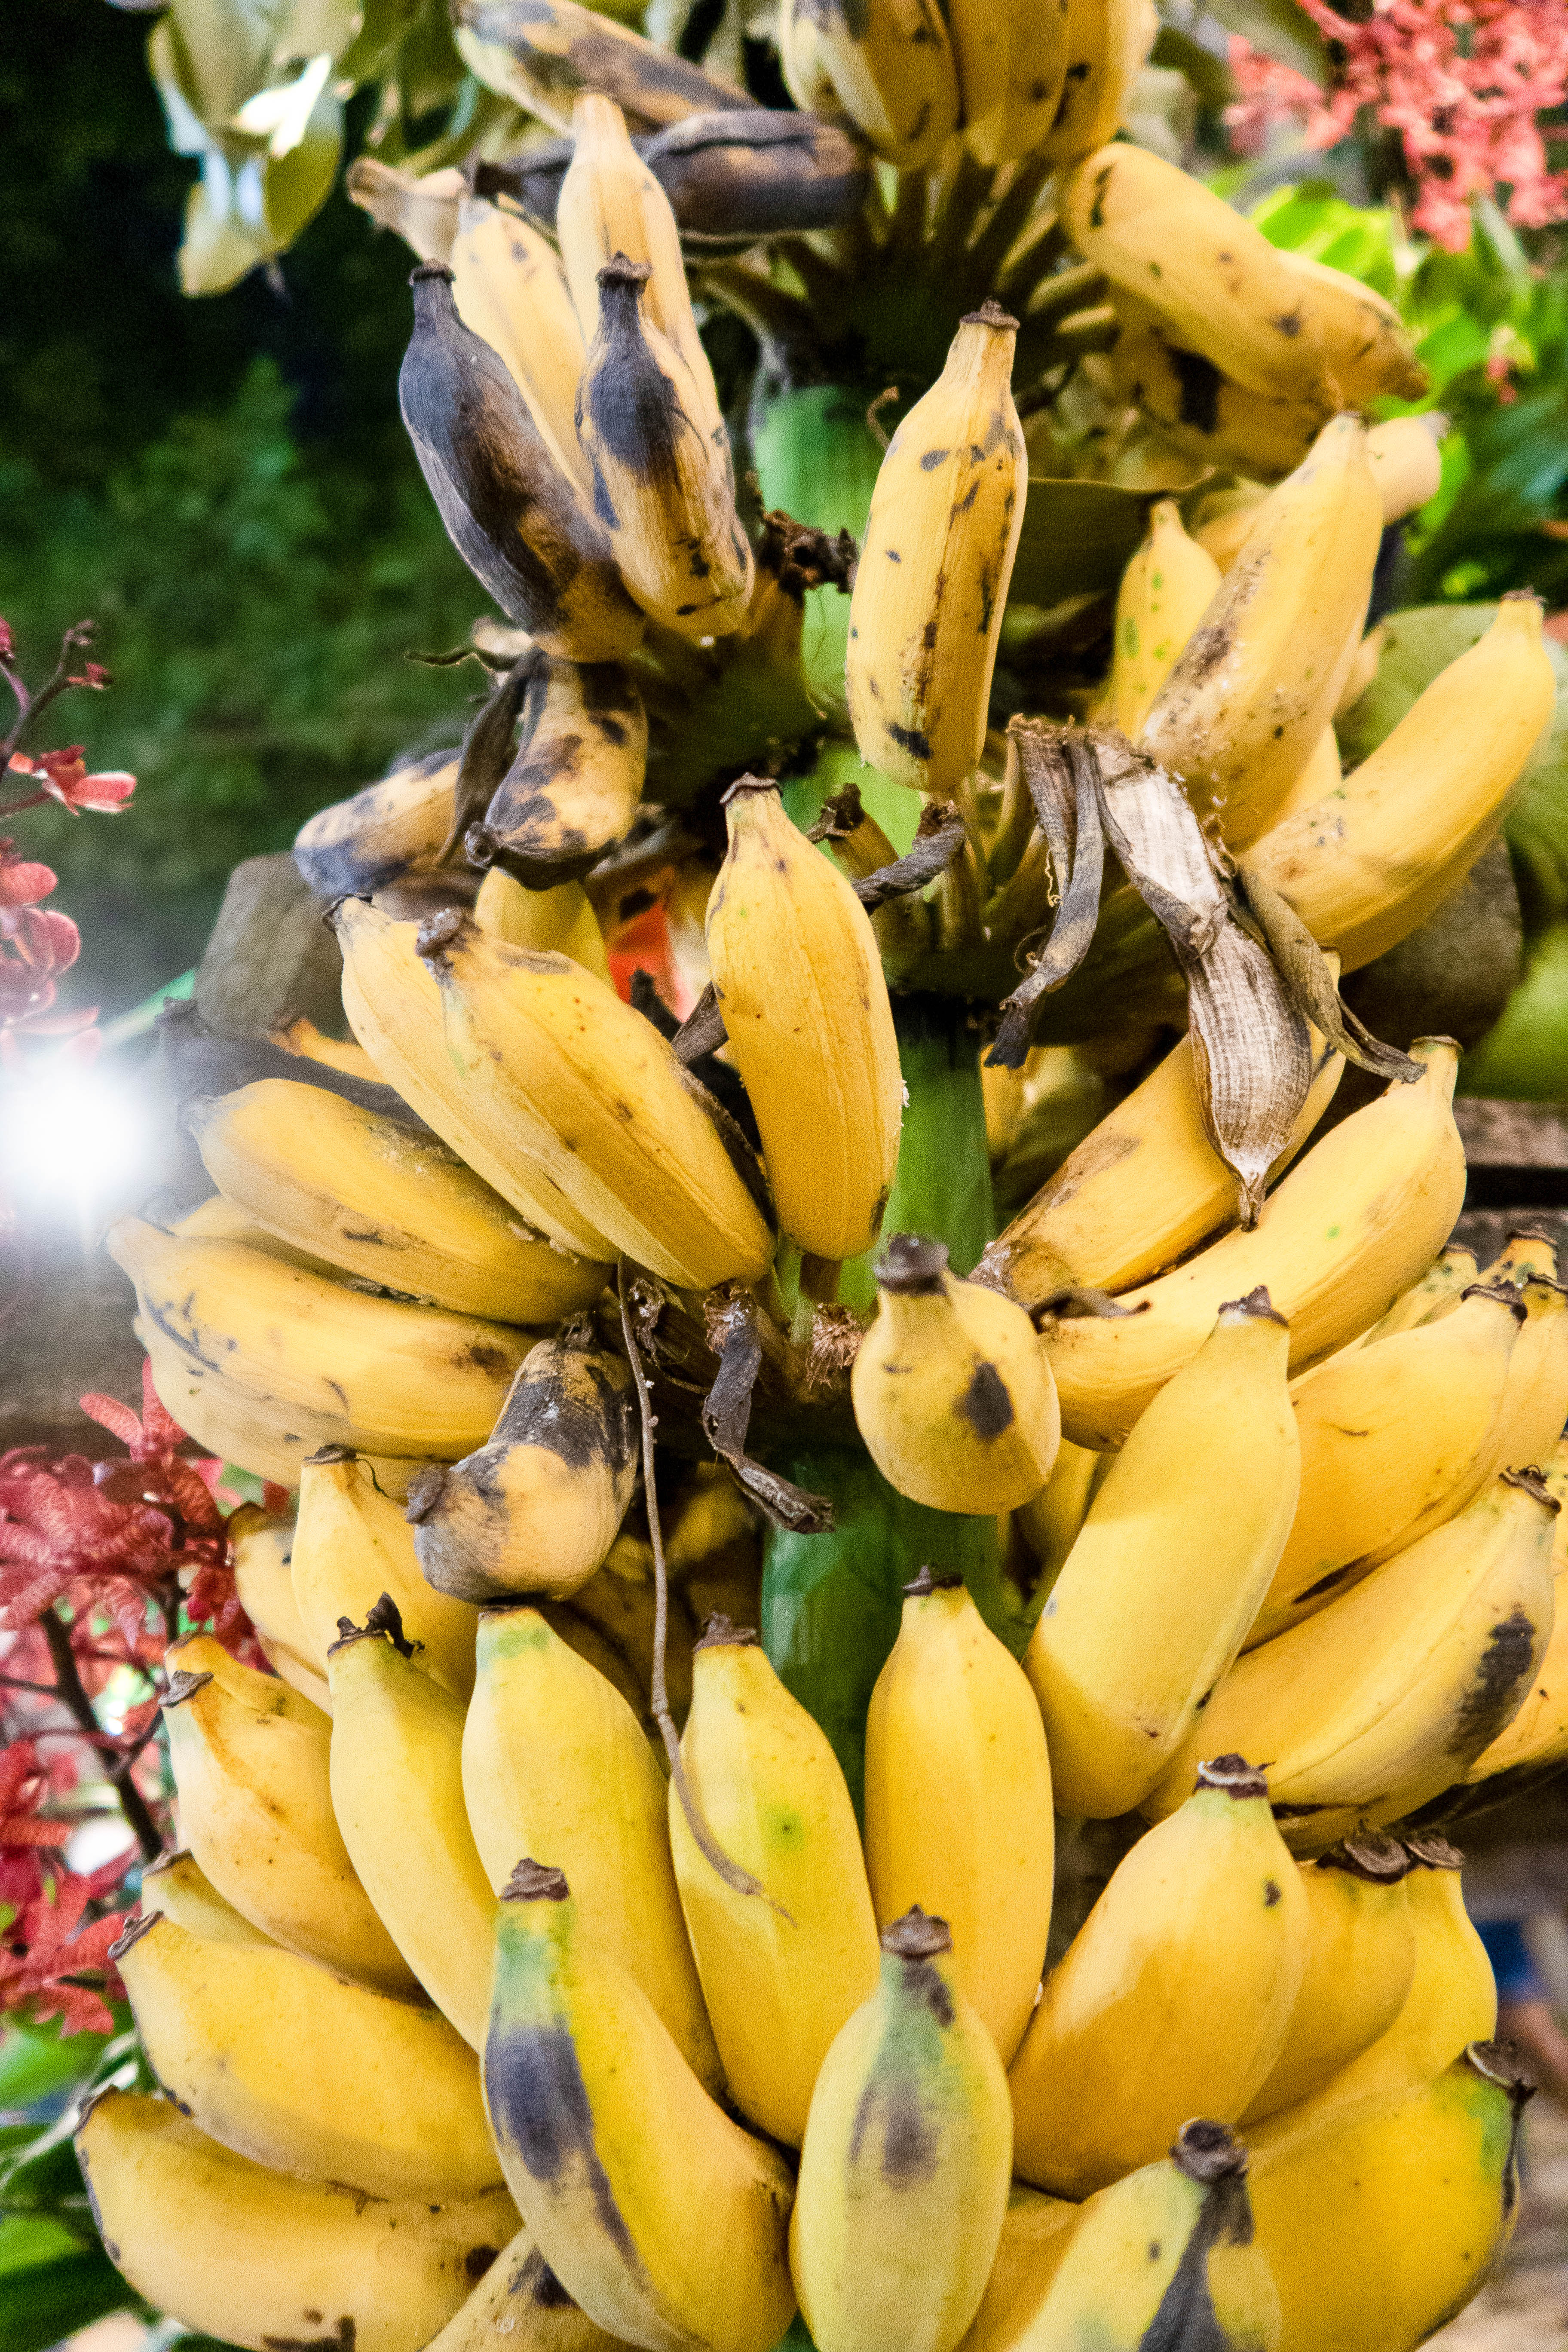 Bananes 3 - FRUITS & LÉGUMES